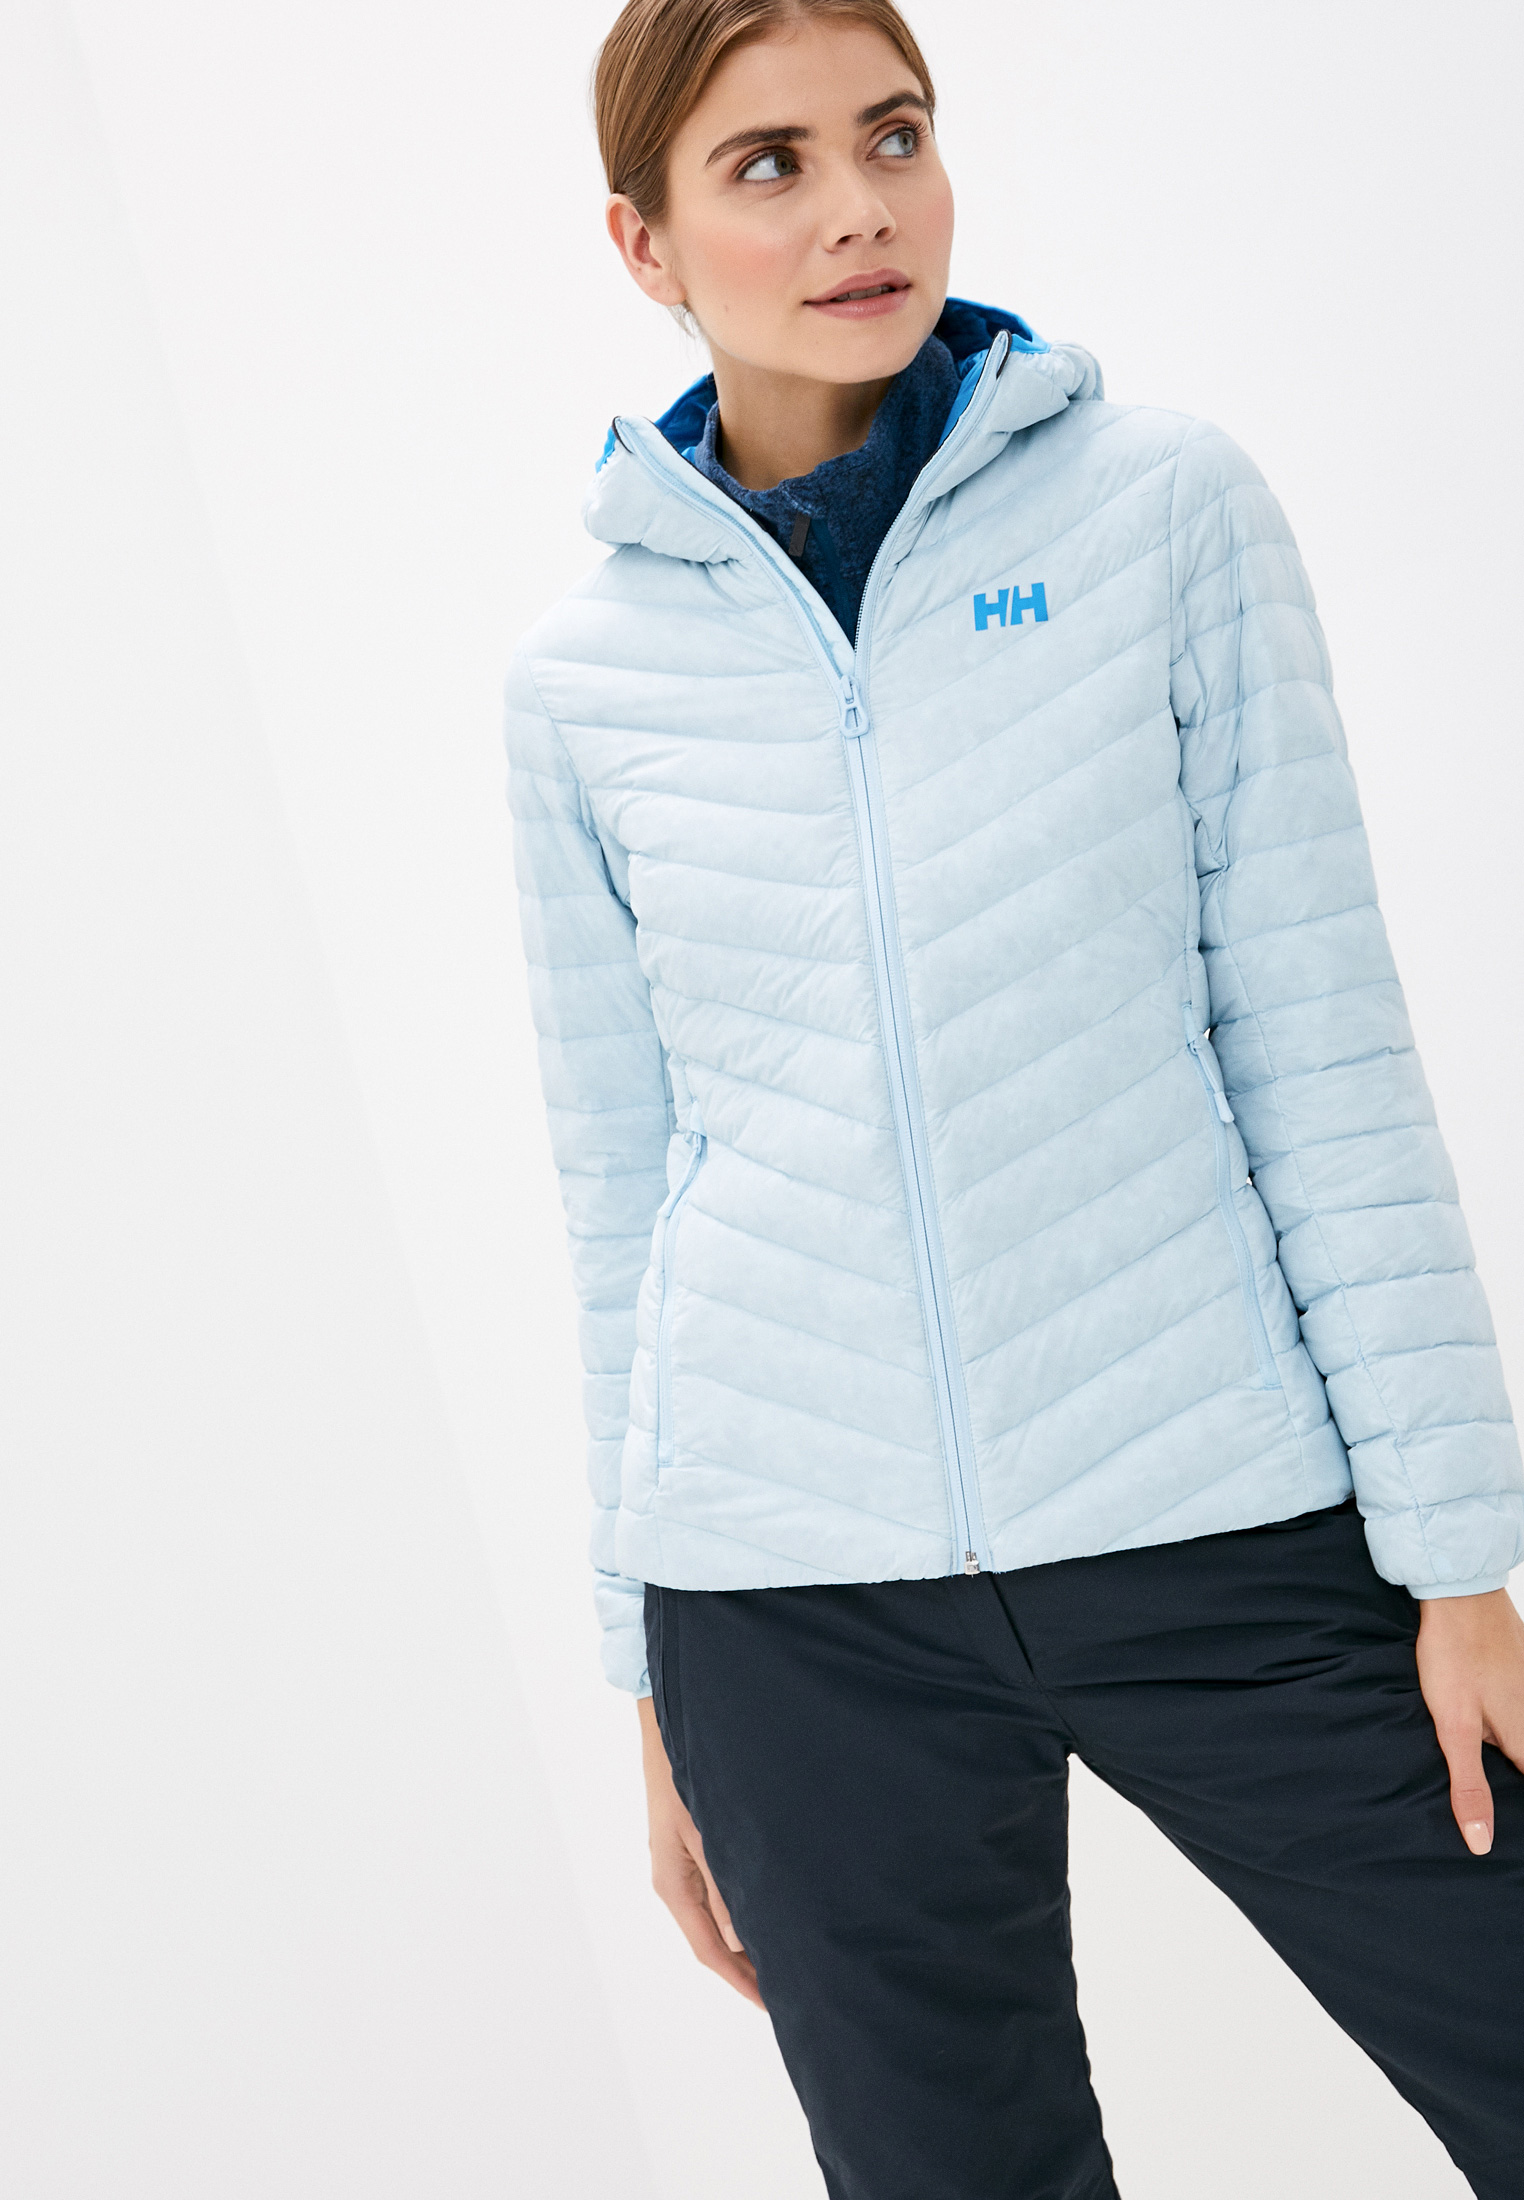 Женская верхняя одежда Helly Hansen (Хелли Хансен) 63027